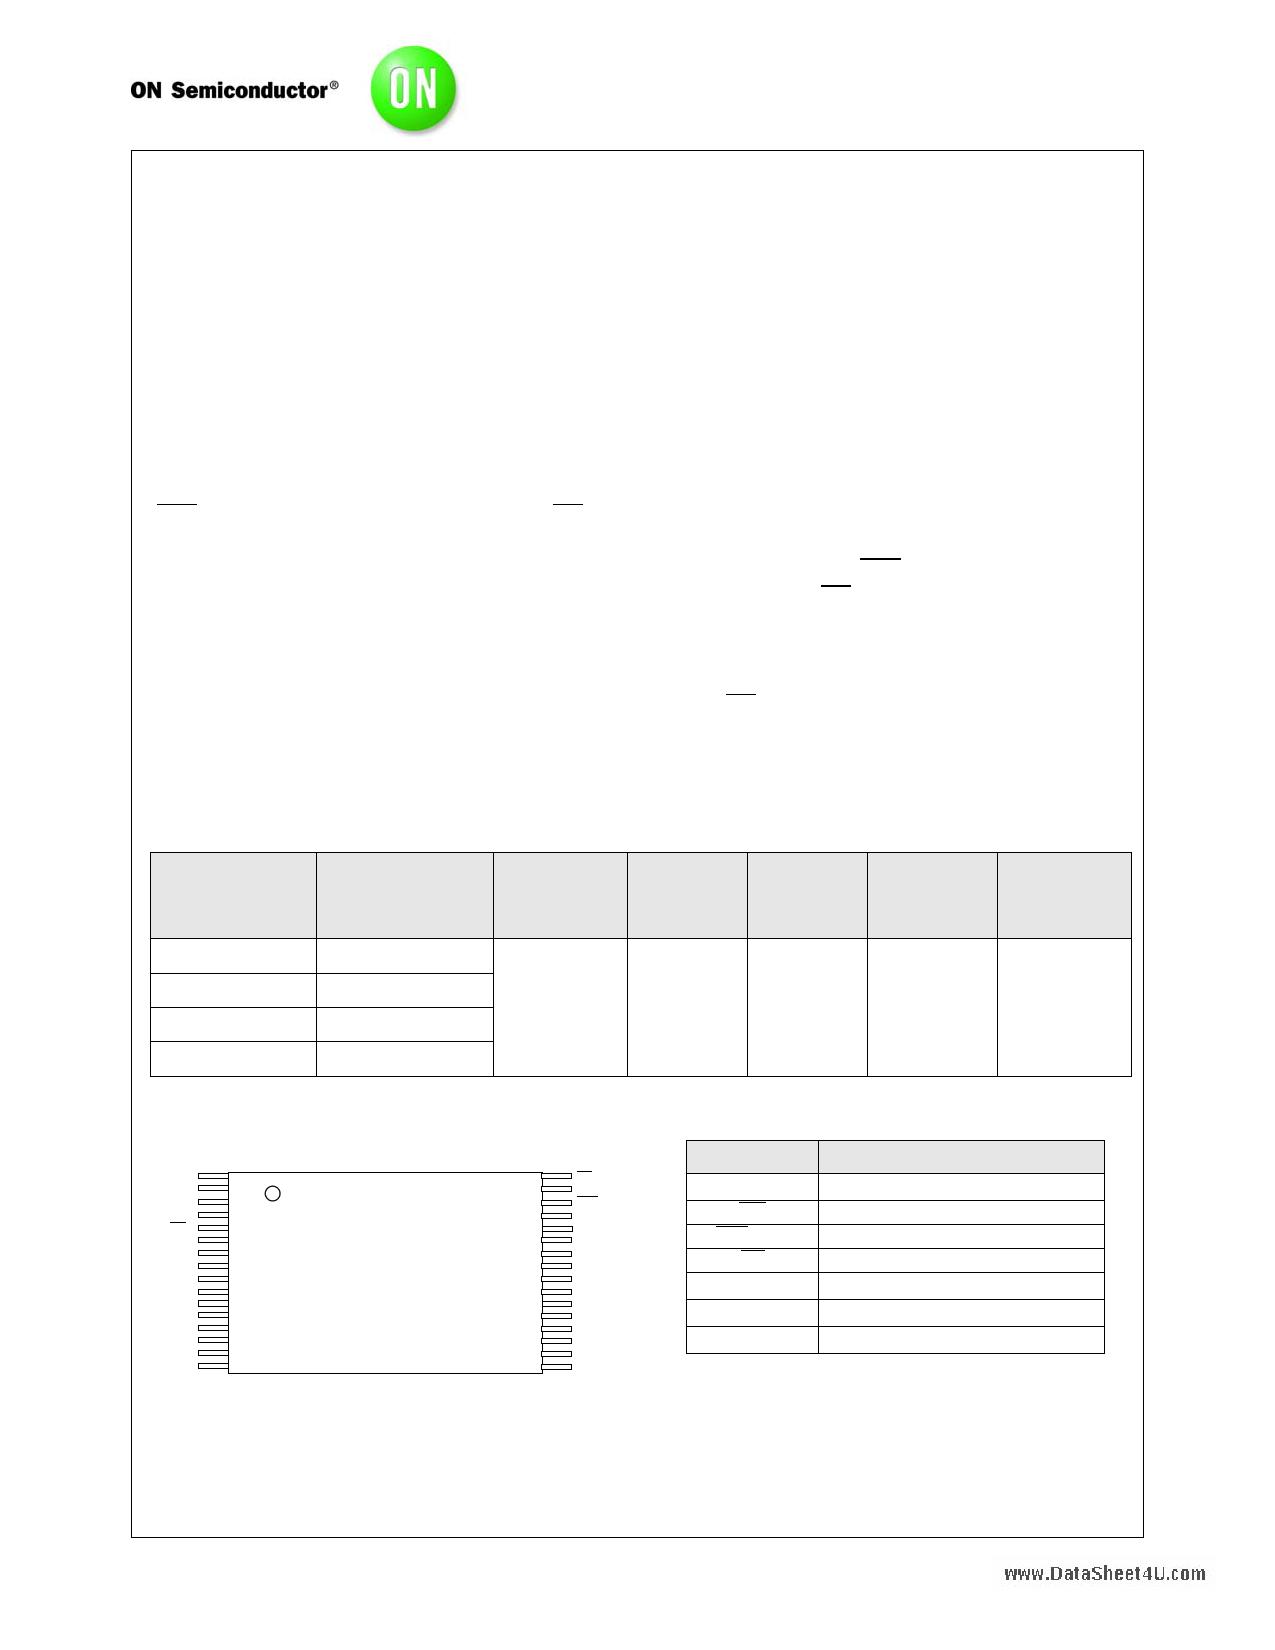 N02L83W2A datasheet